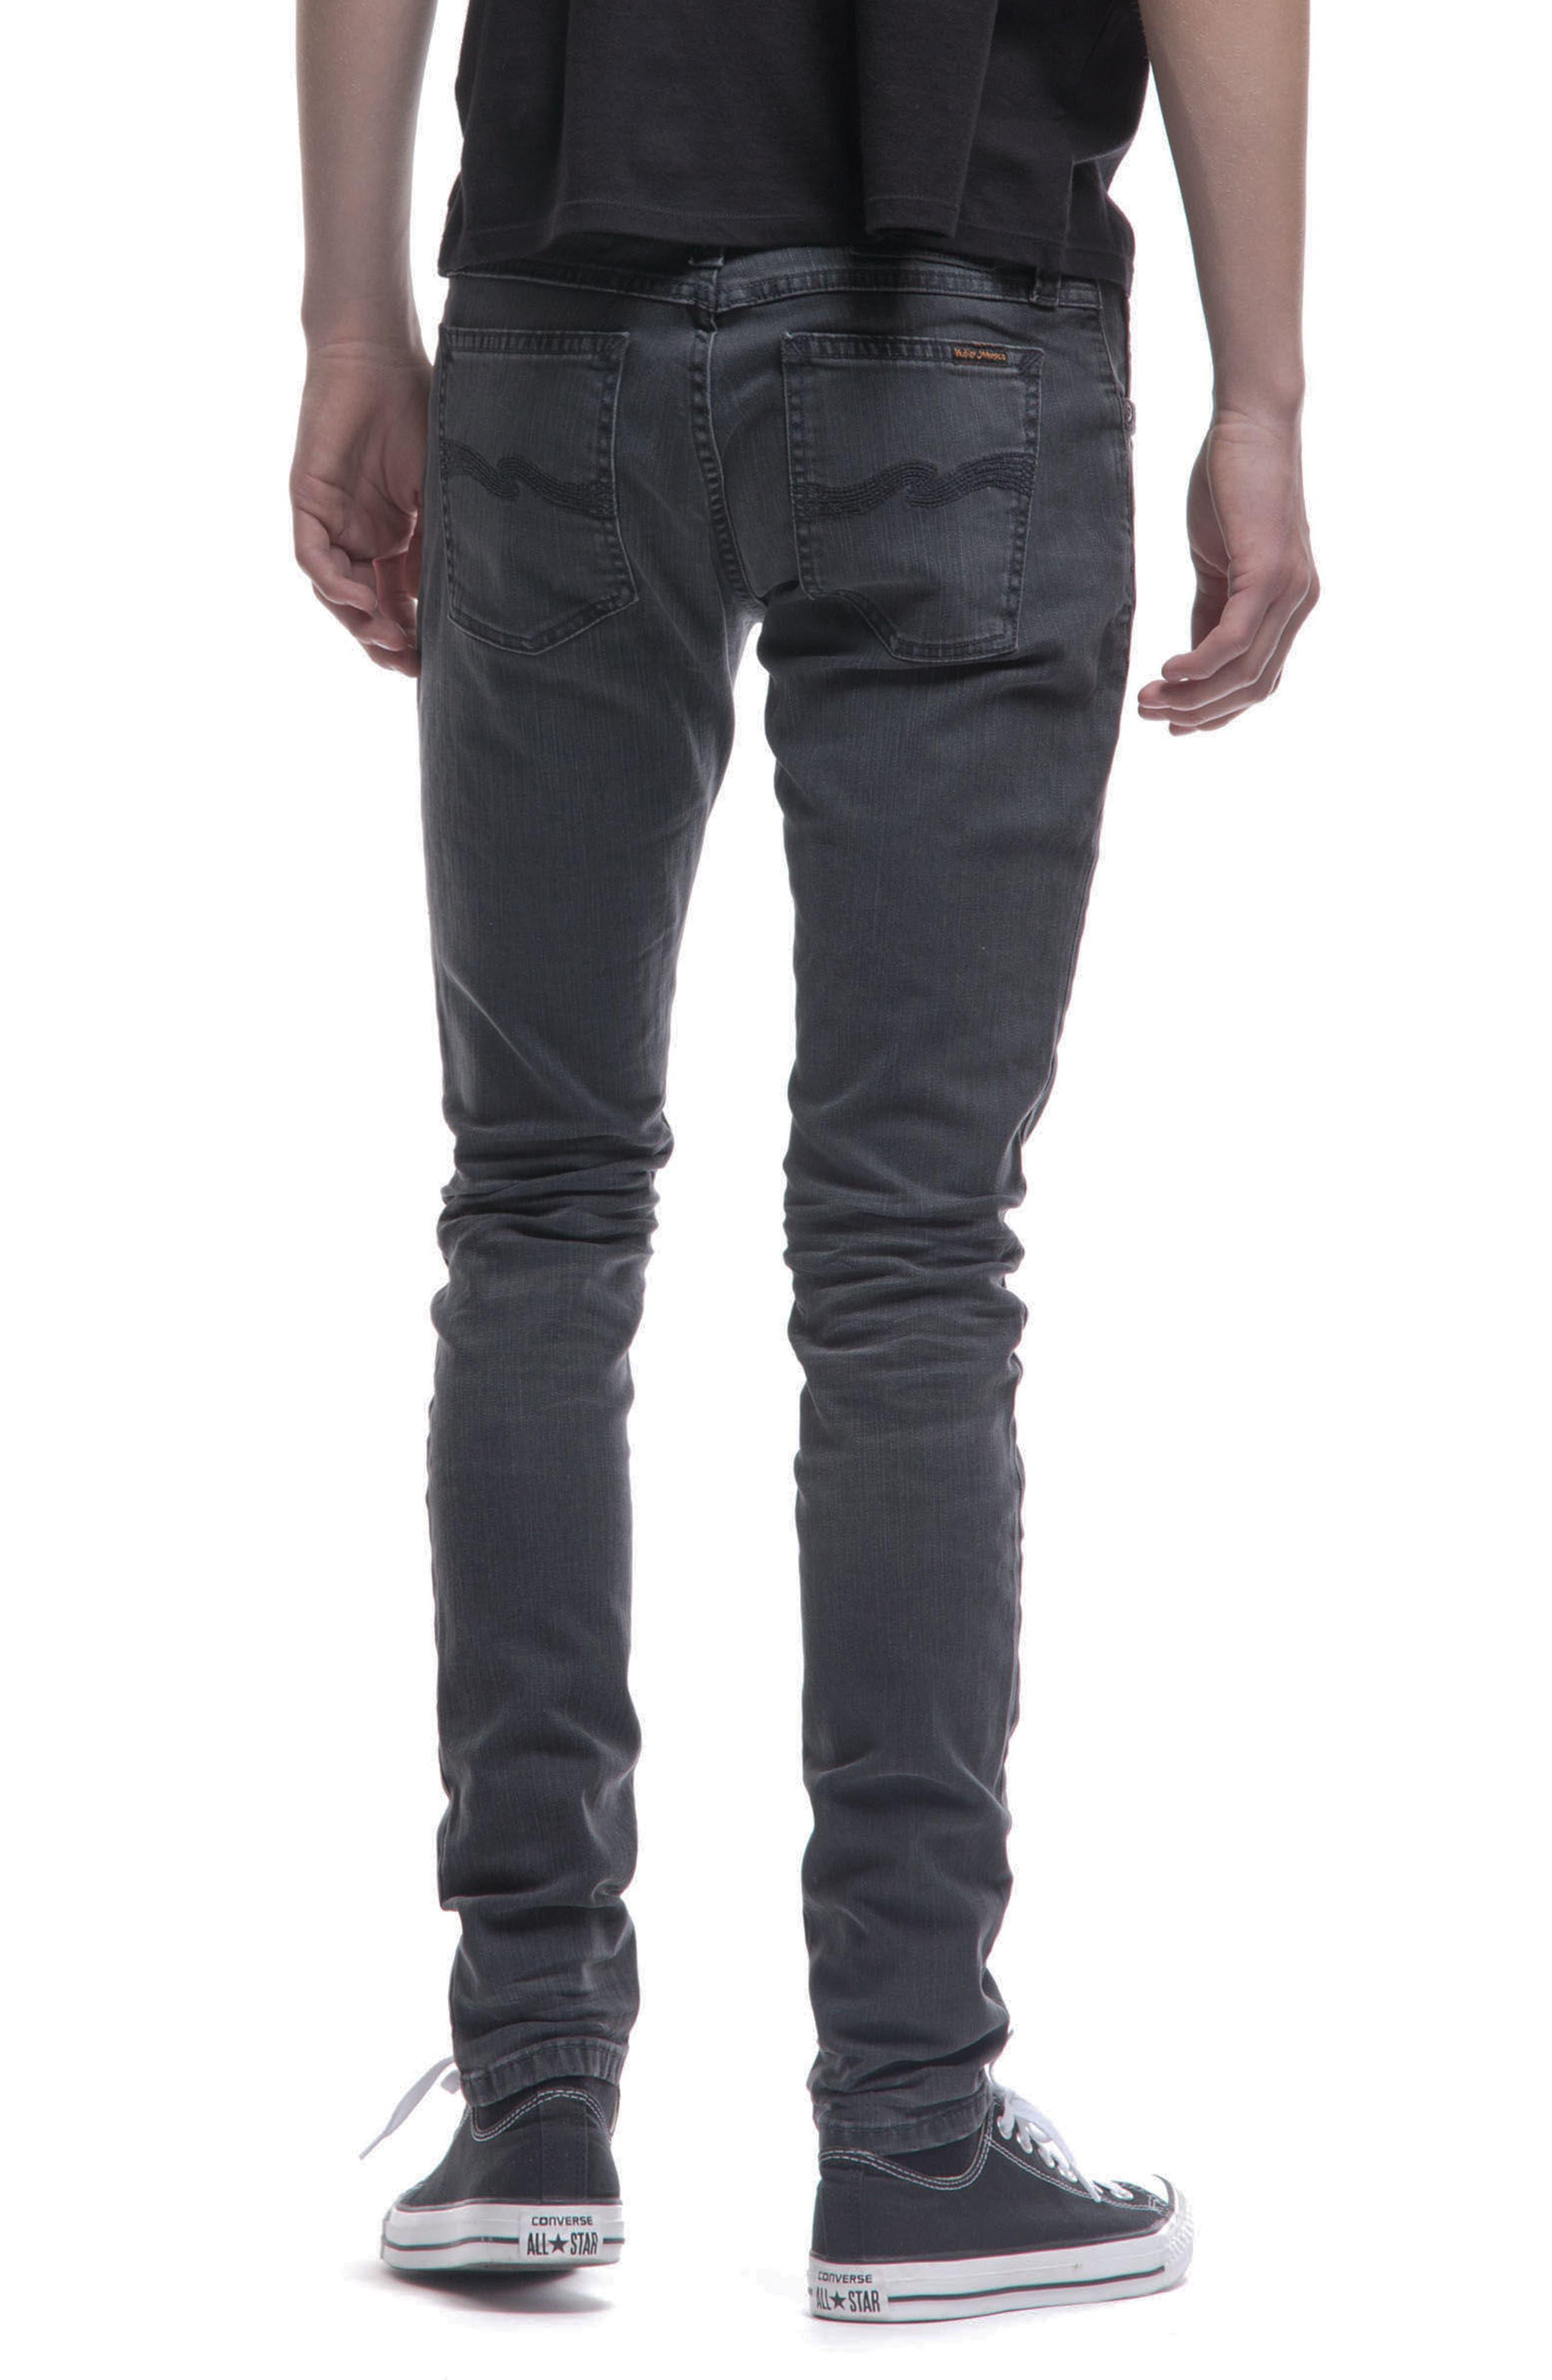 Skinny Lin Skinny Fit Jeans,                             Alternate thumbnail 2, color,